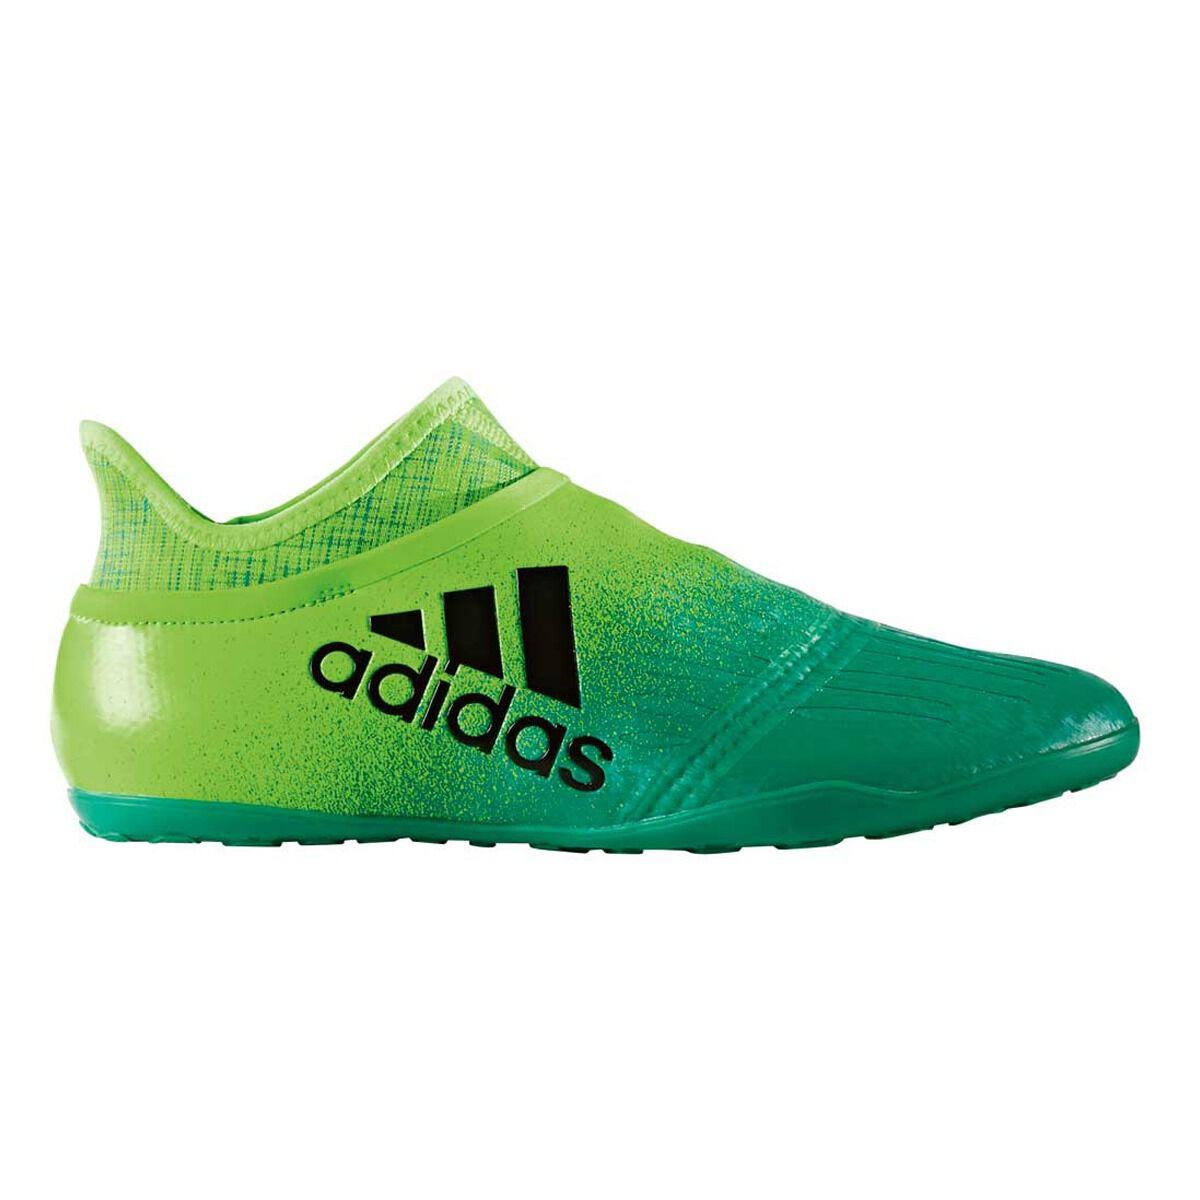 ... get adidas x tango 16 purespeed indoor soccer shoes green black us 10  adult 74f54 f310f ... 6aacd34cb